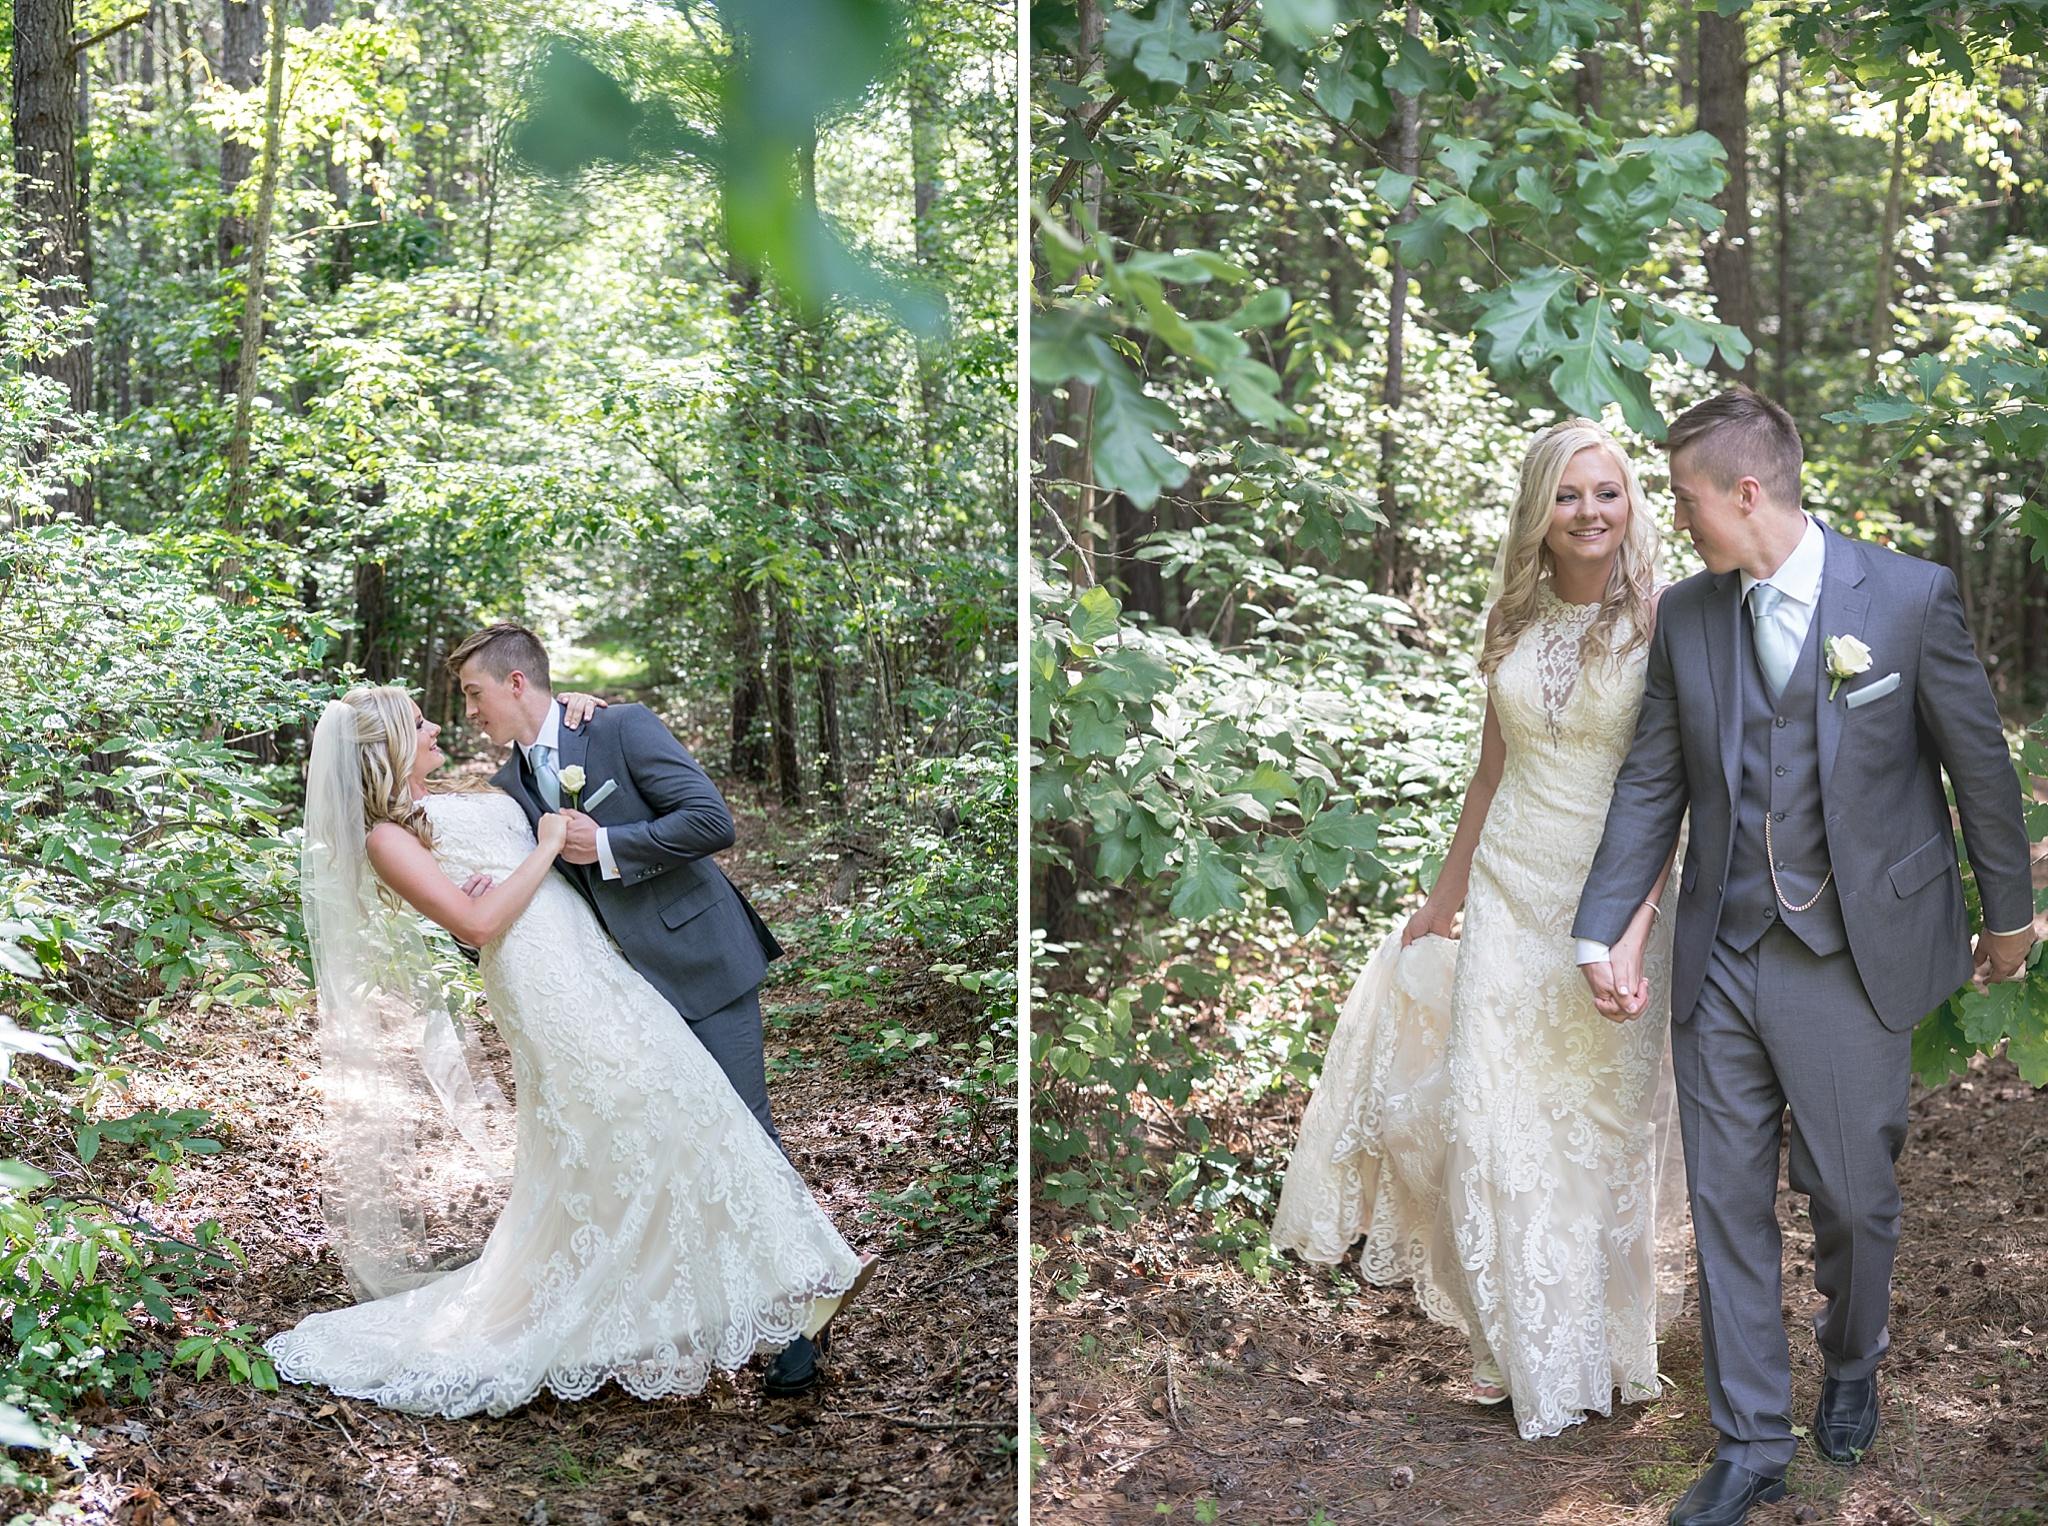 Shady-Wagon-Farm-NC-Wedding-Photographer-0172.jpg